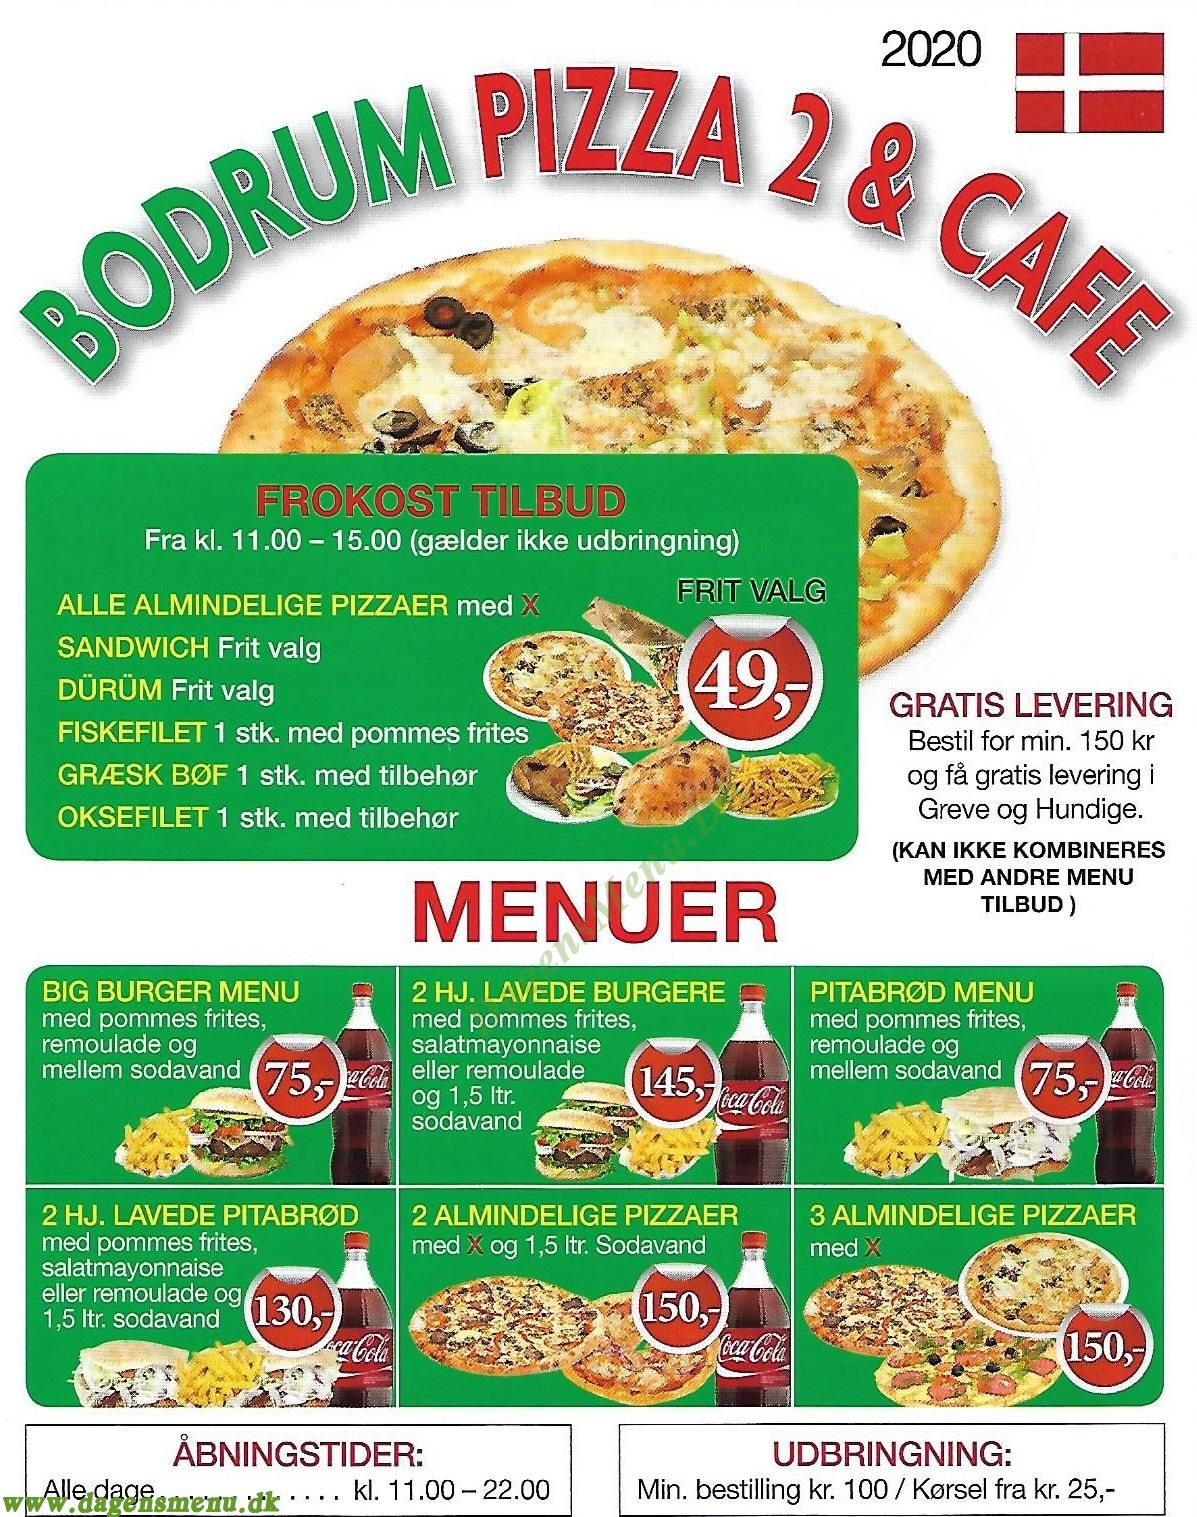 Bodrum Pizza Bar 2 - Menukort